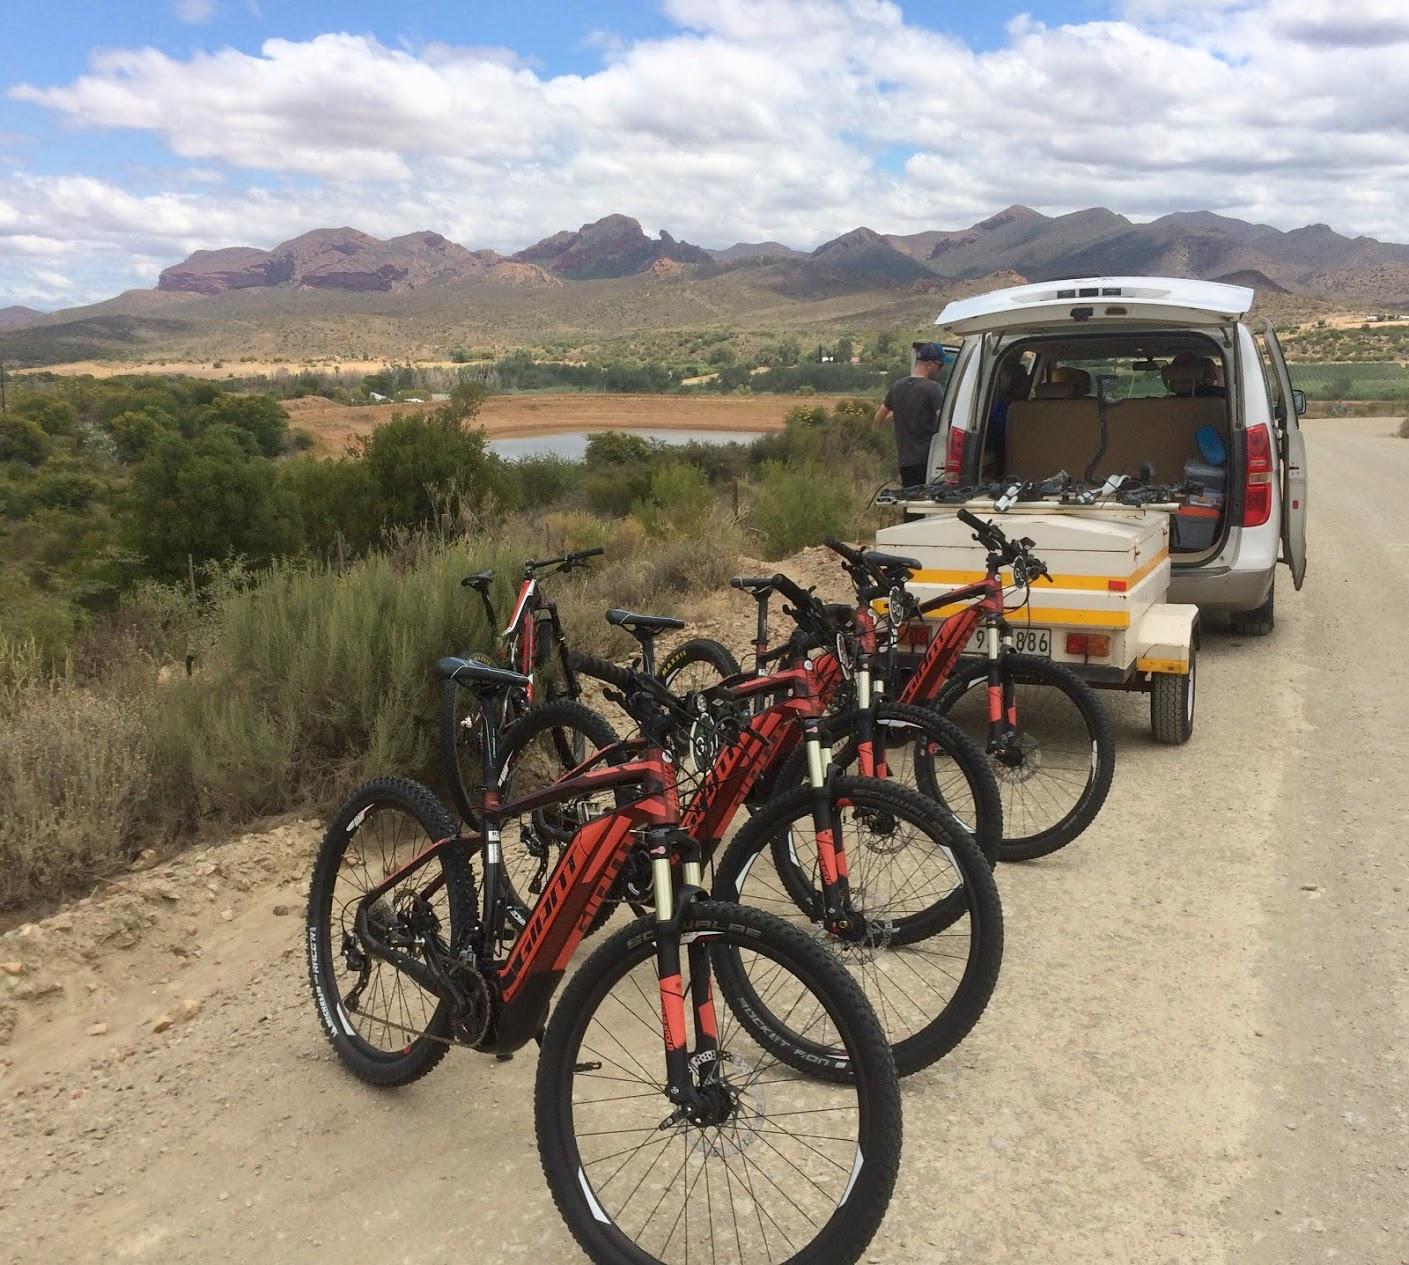 ebikes biking south africa western cape craig edwards